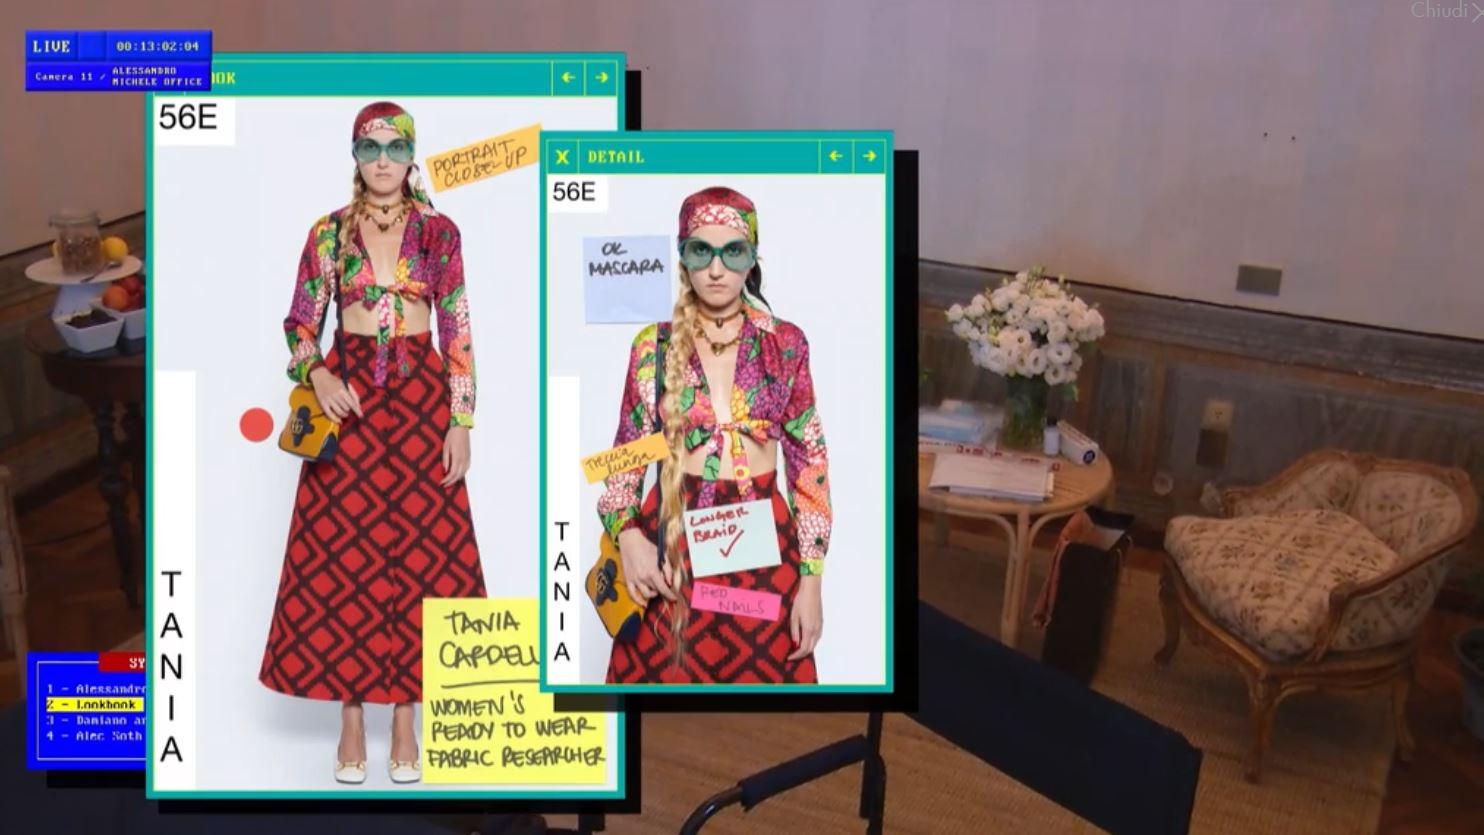 Gucci video milan fashion week pynck.JPG